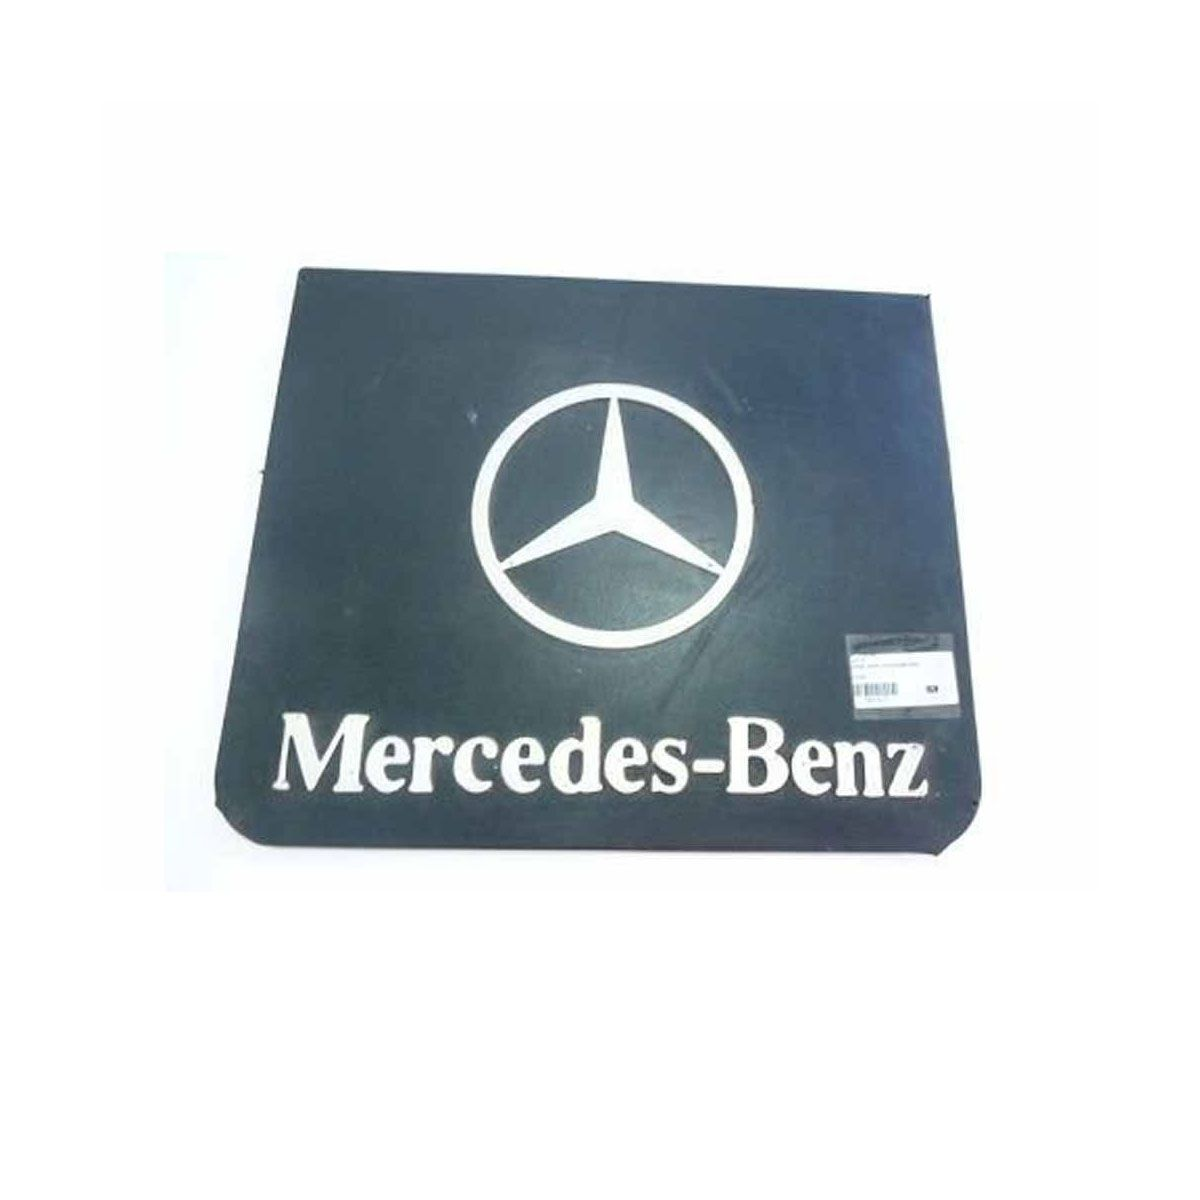 Apara Barro Dianteiro Injetado para Mercedes Benz (42x30)